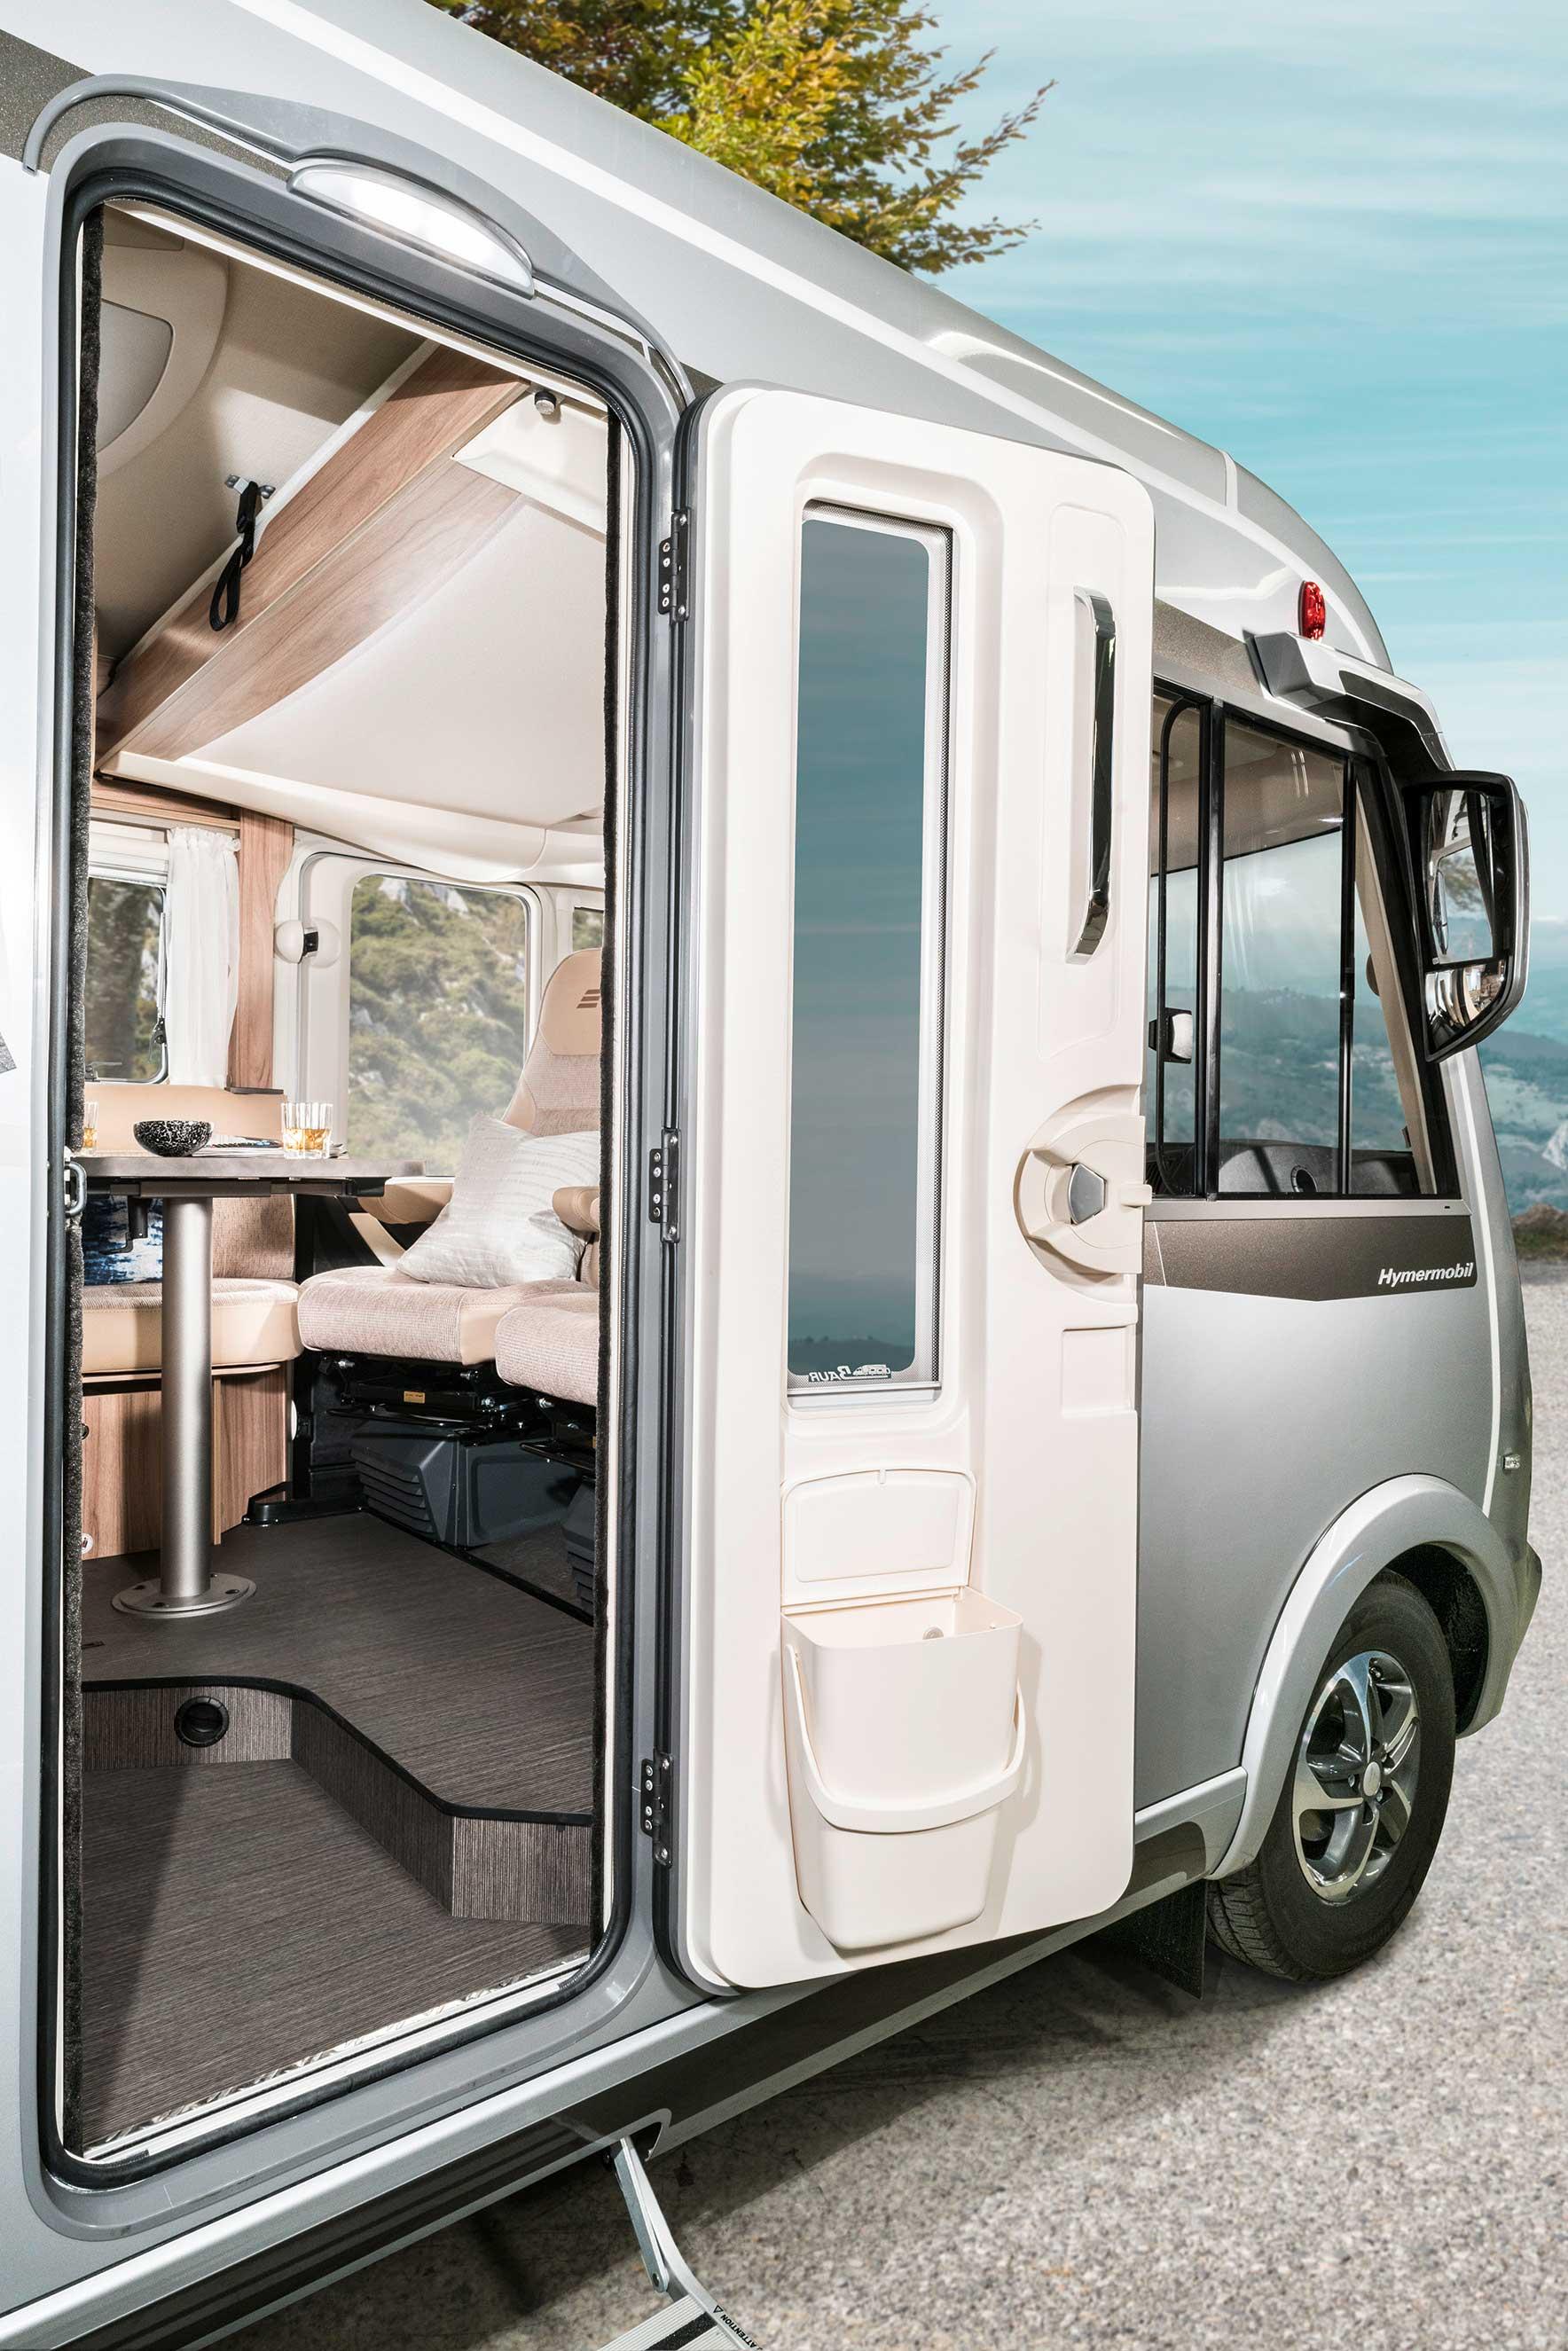 hymer exsis i 688 2014 technische daten. Black Bedroom Furniture Sets. Home Design Ideas